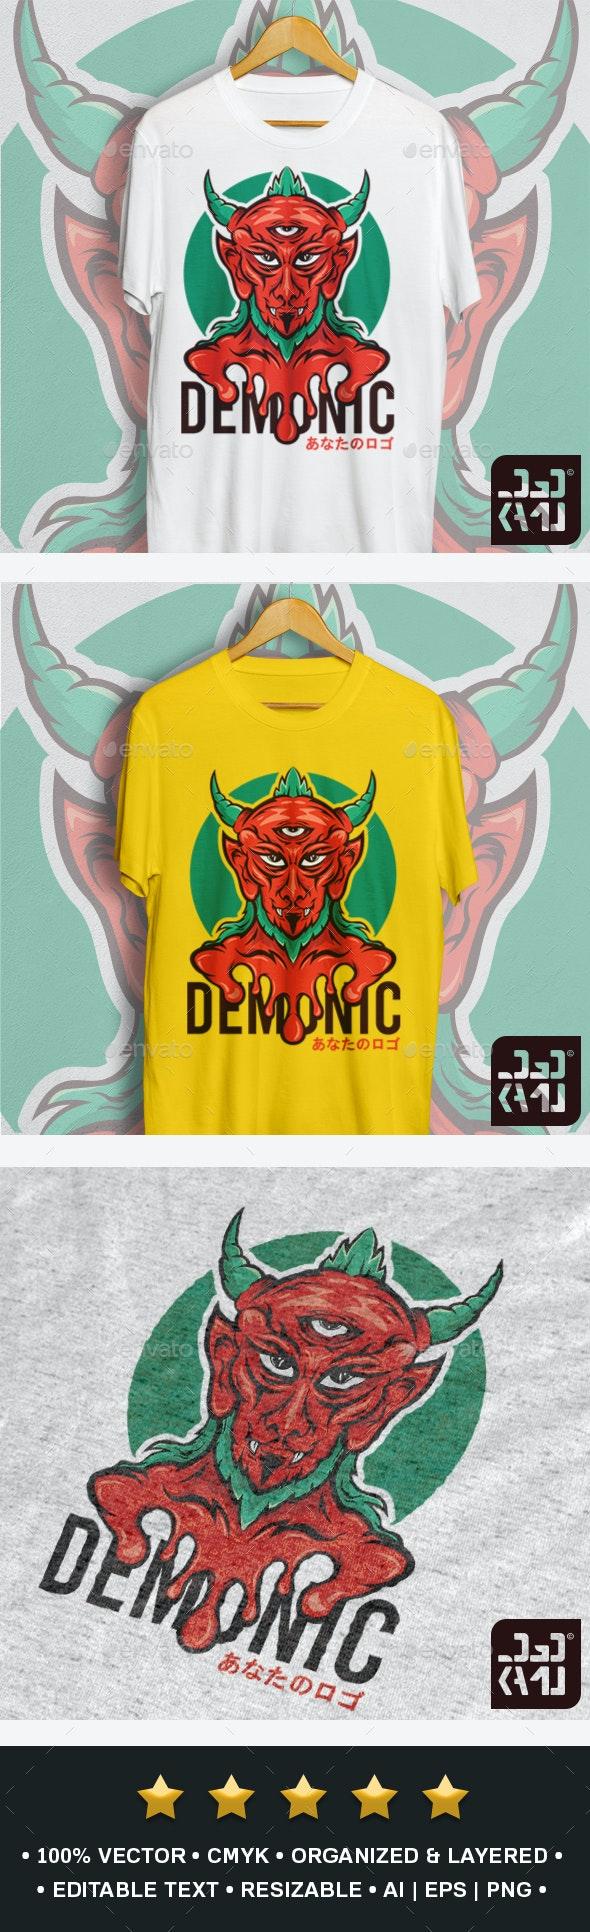 Demon T-Shirt - Designs T-Shirts